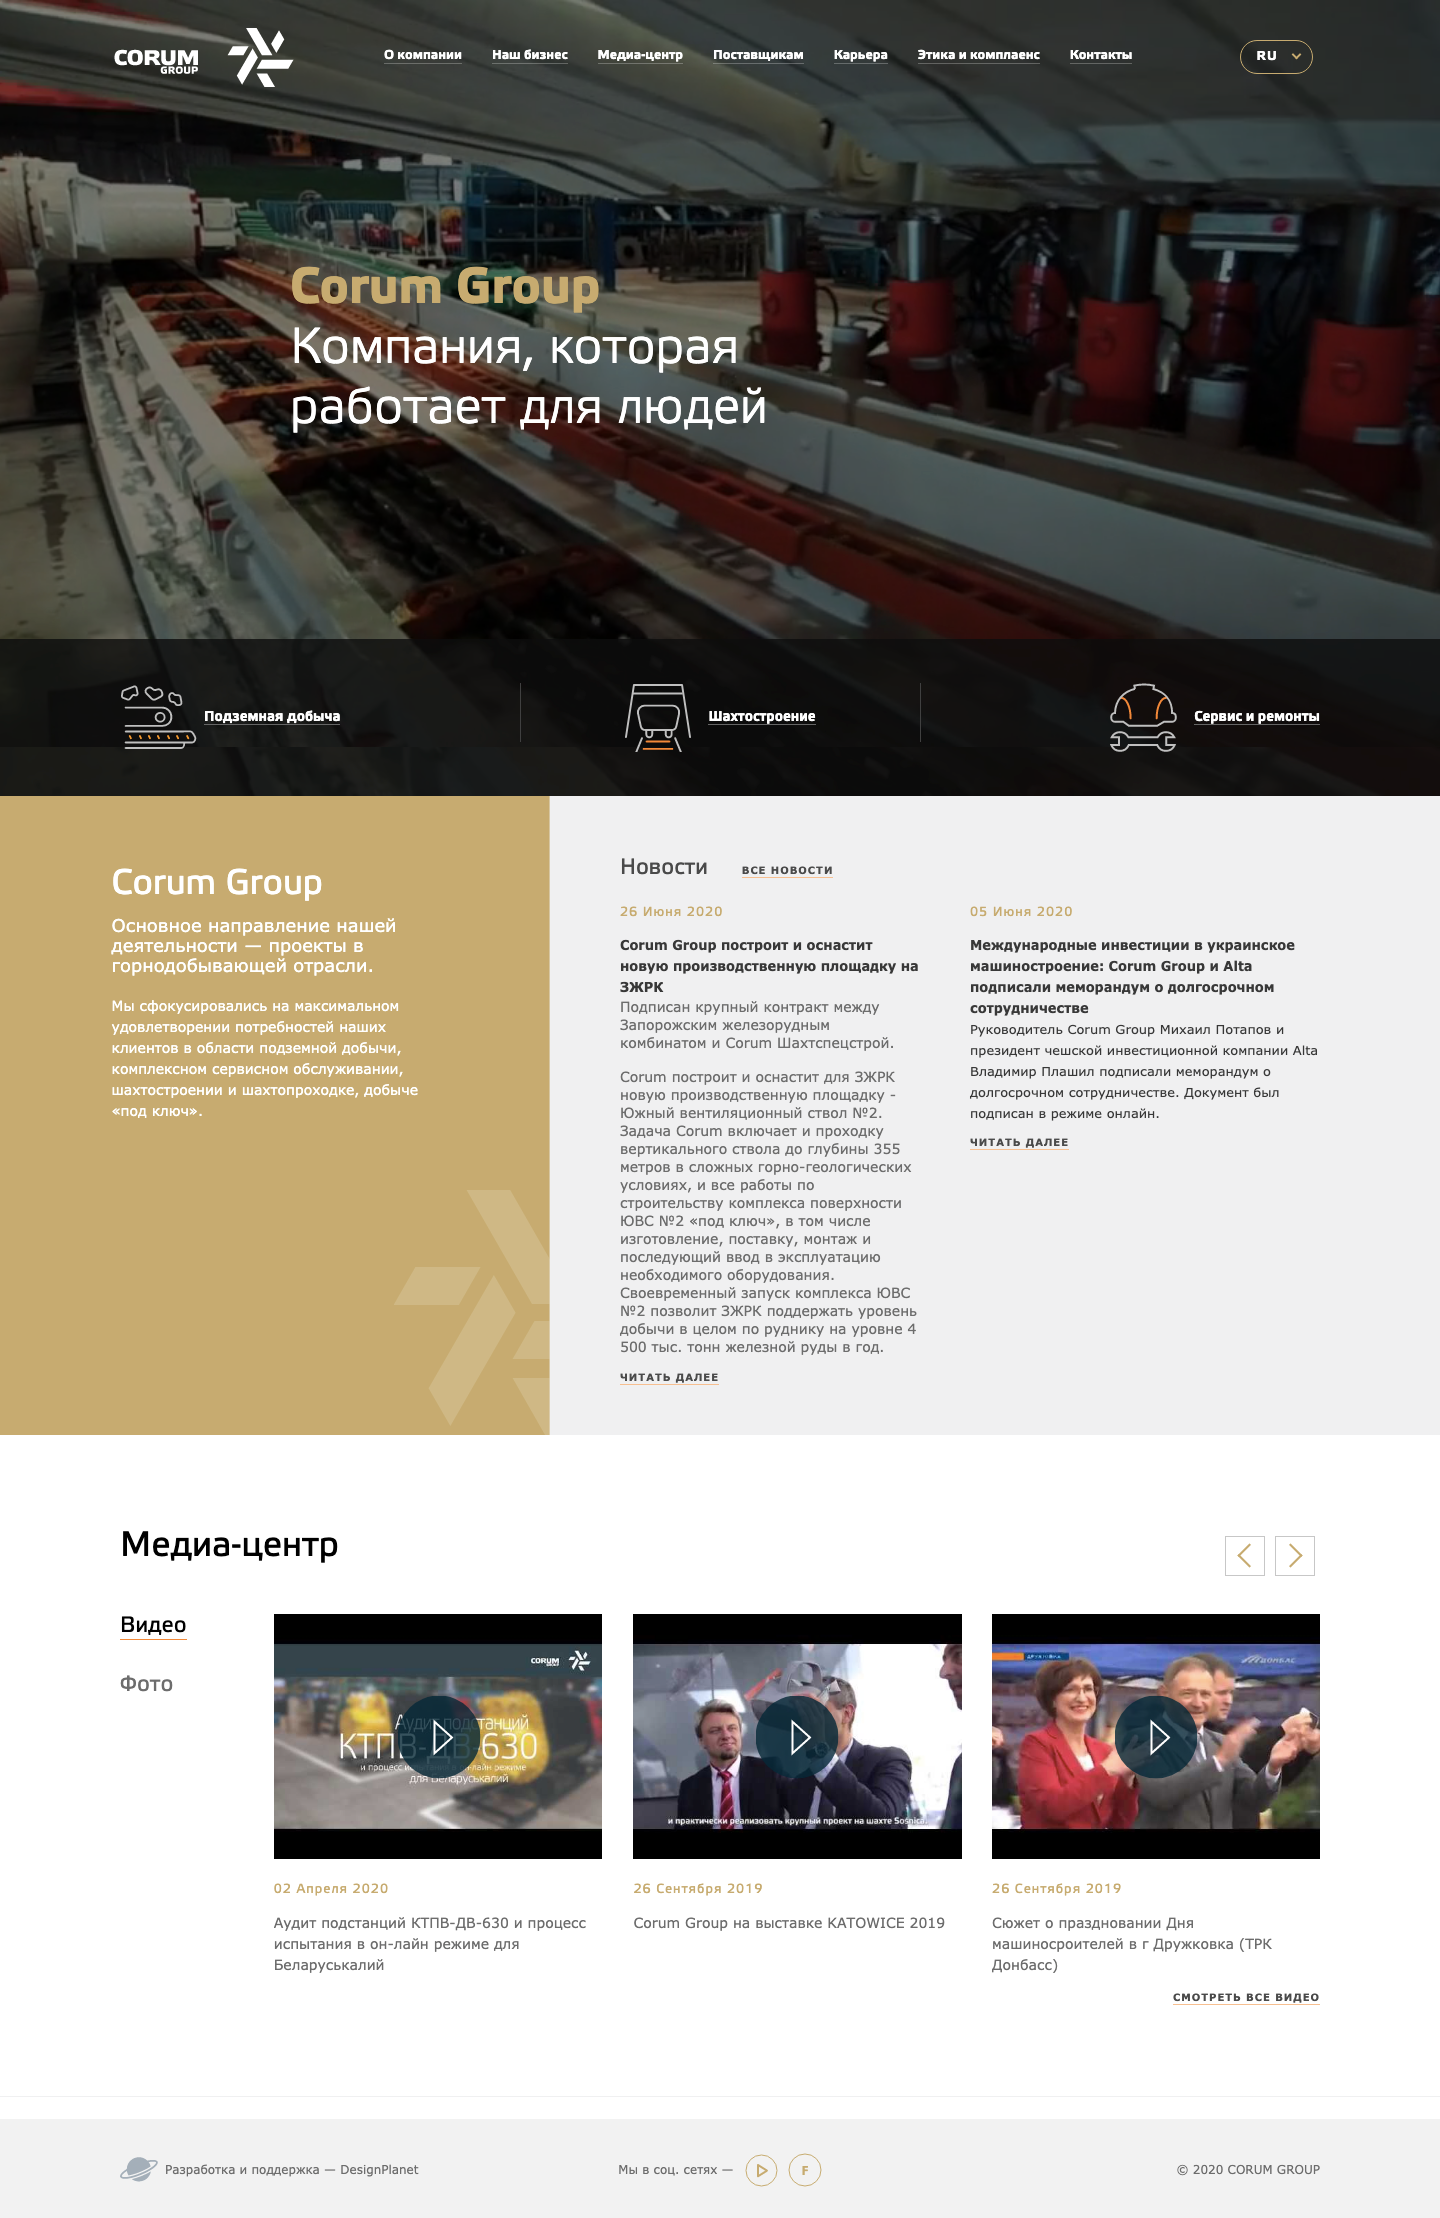 Corum - корпоративный сайт